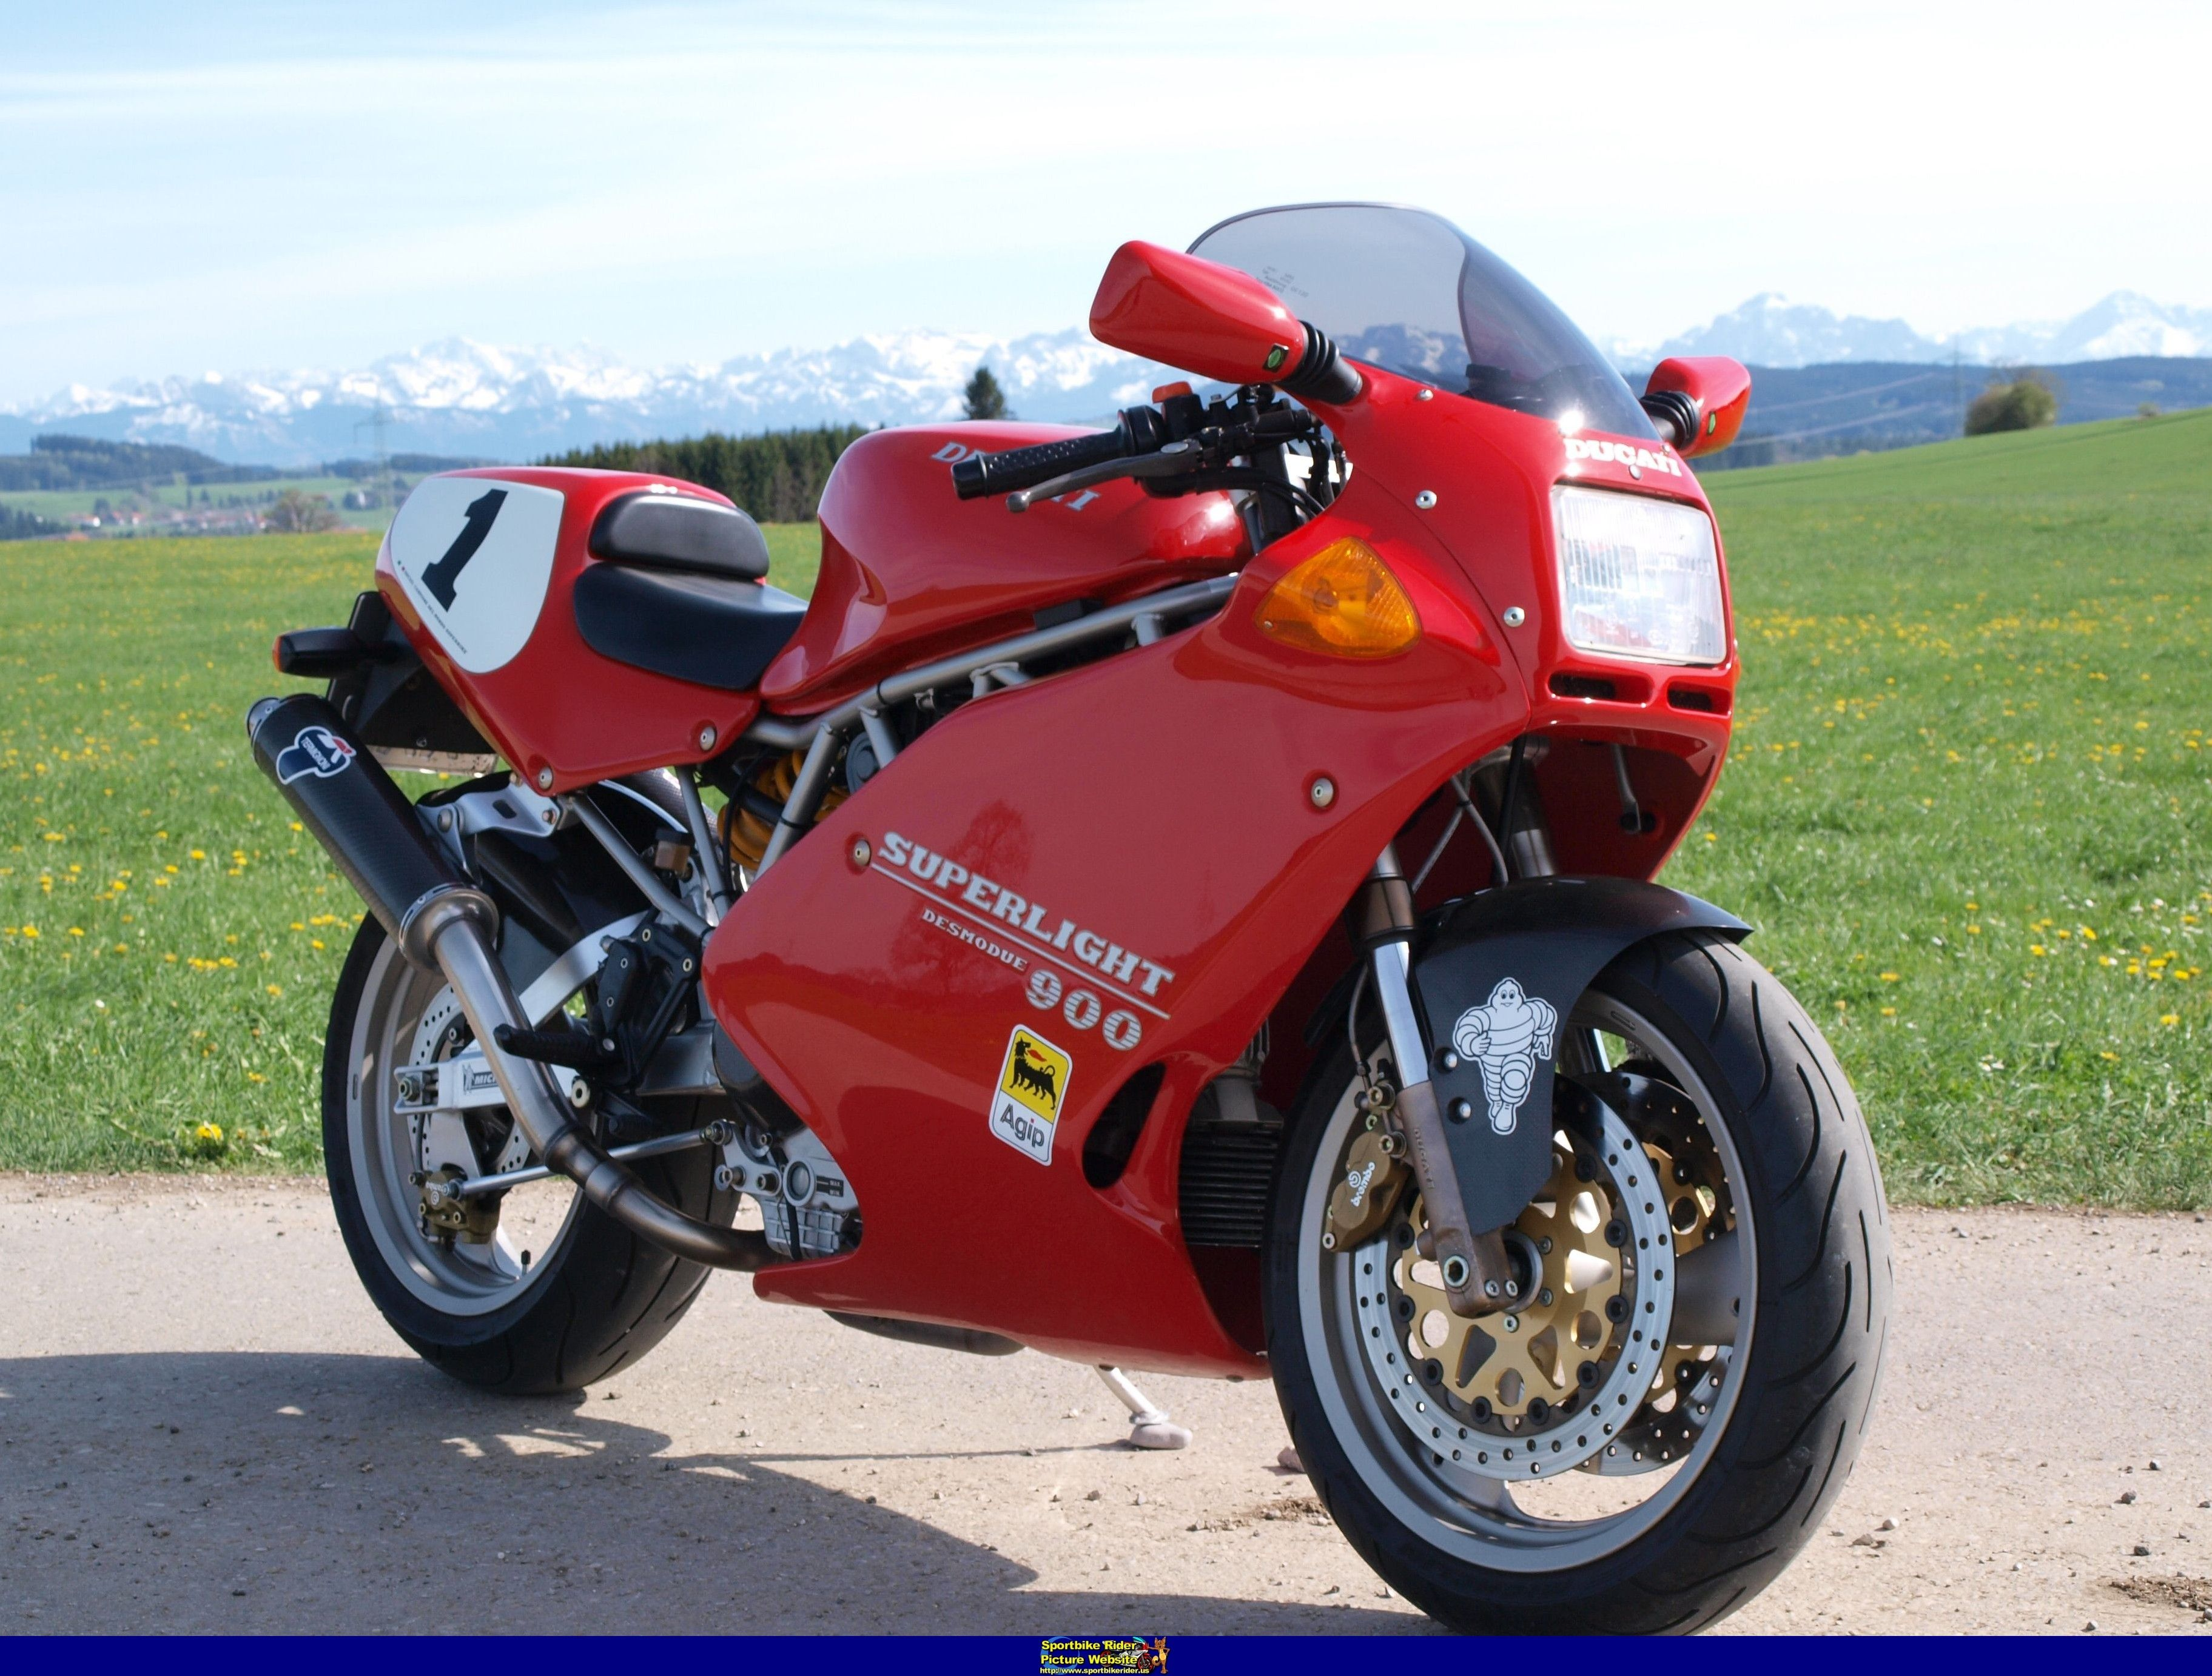 Ducati Superlight 900 Desmodue